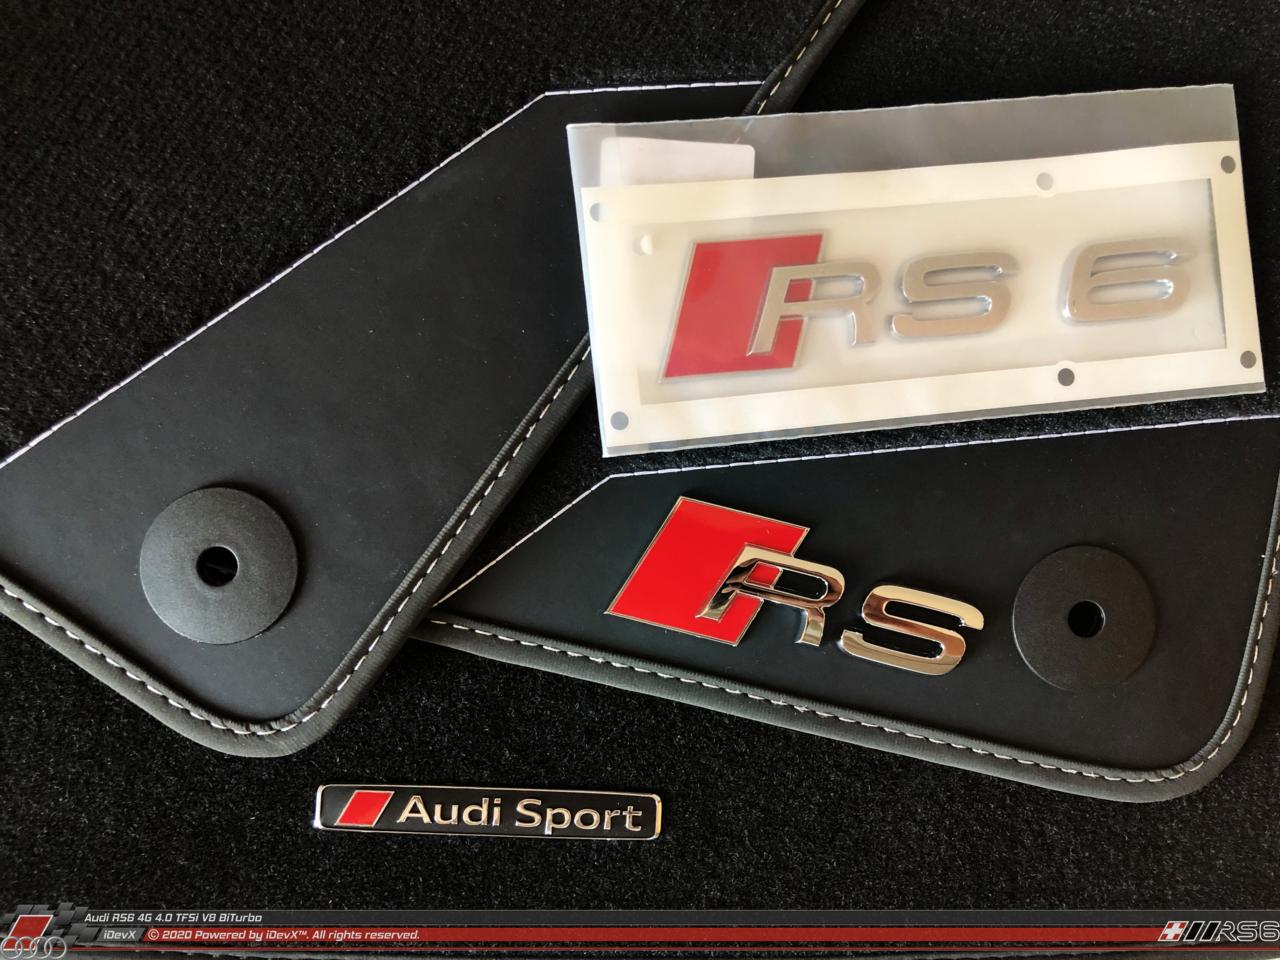 15_08.2019_Audi-RS6_iDevX_015.png